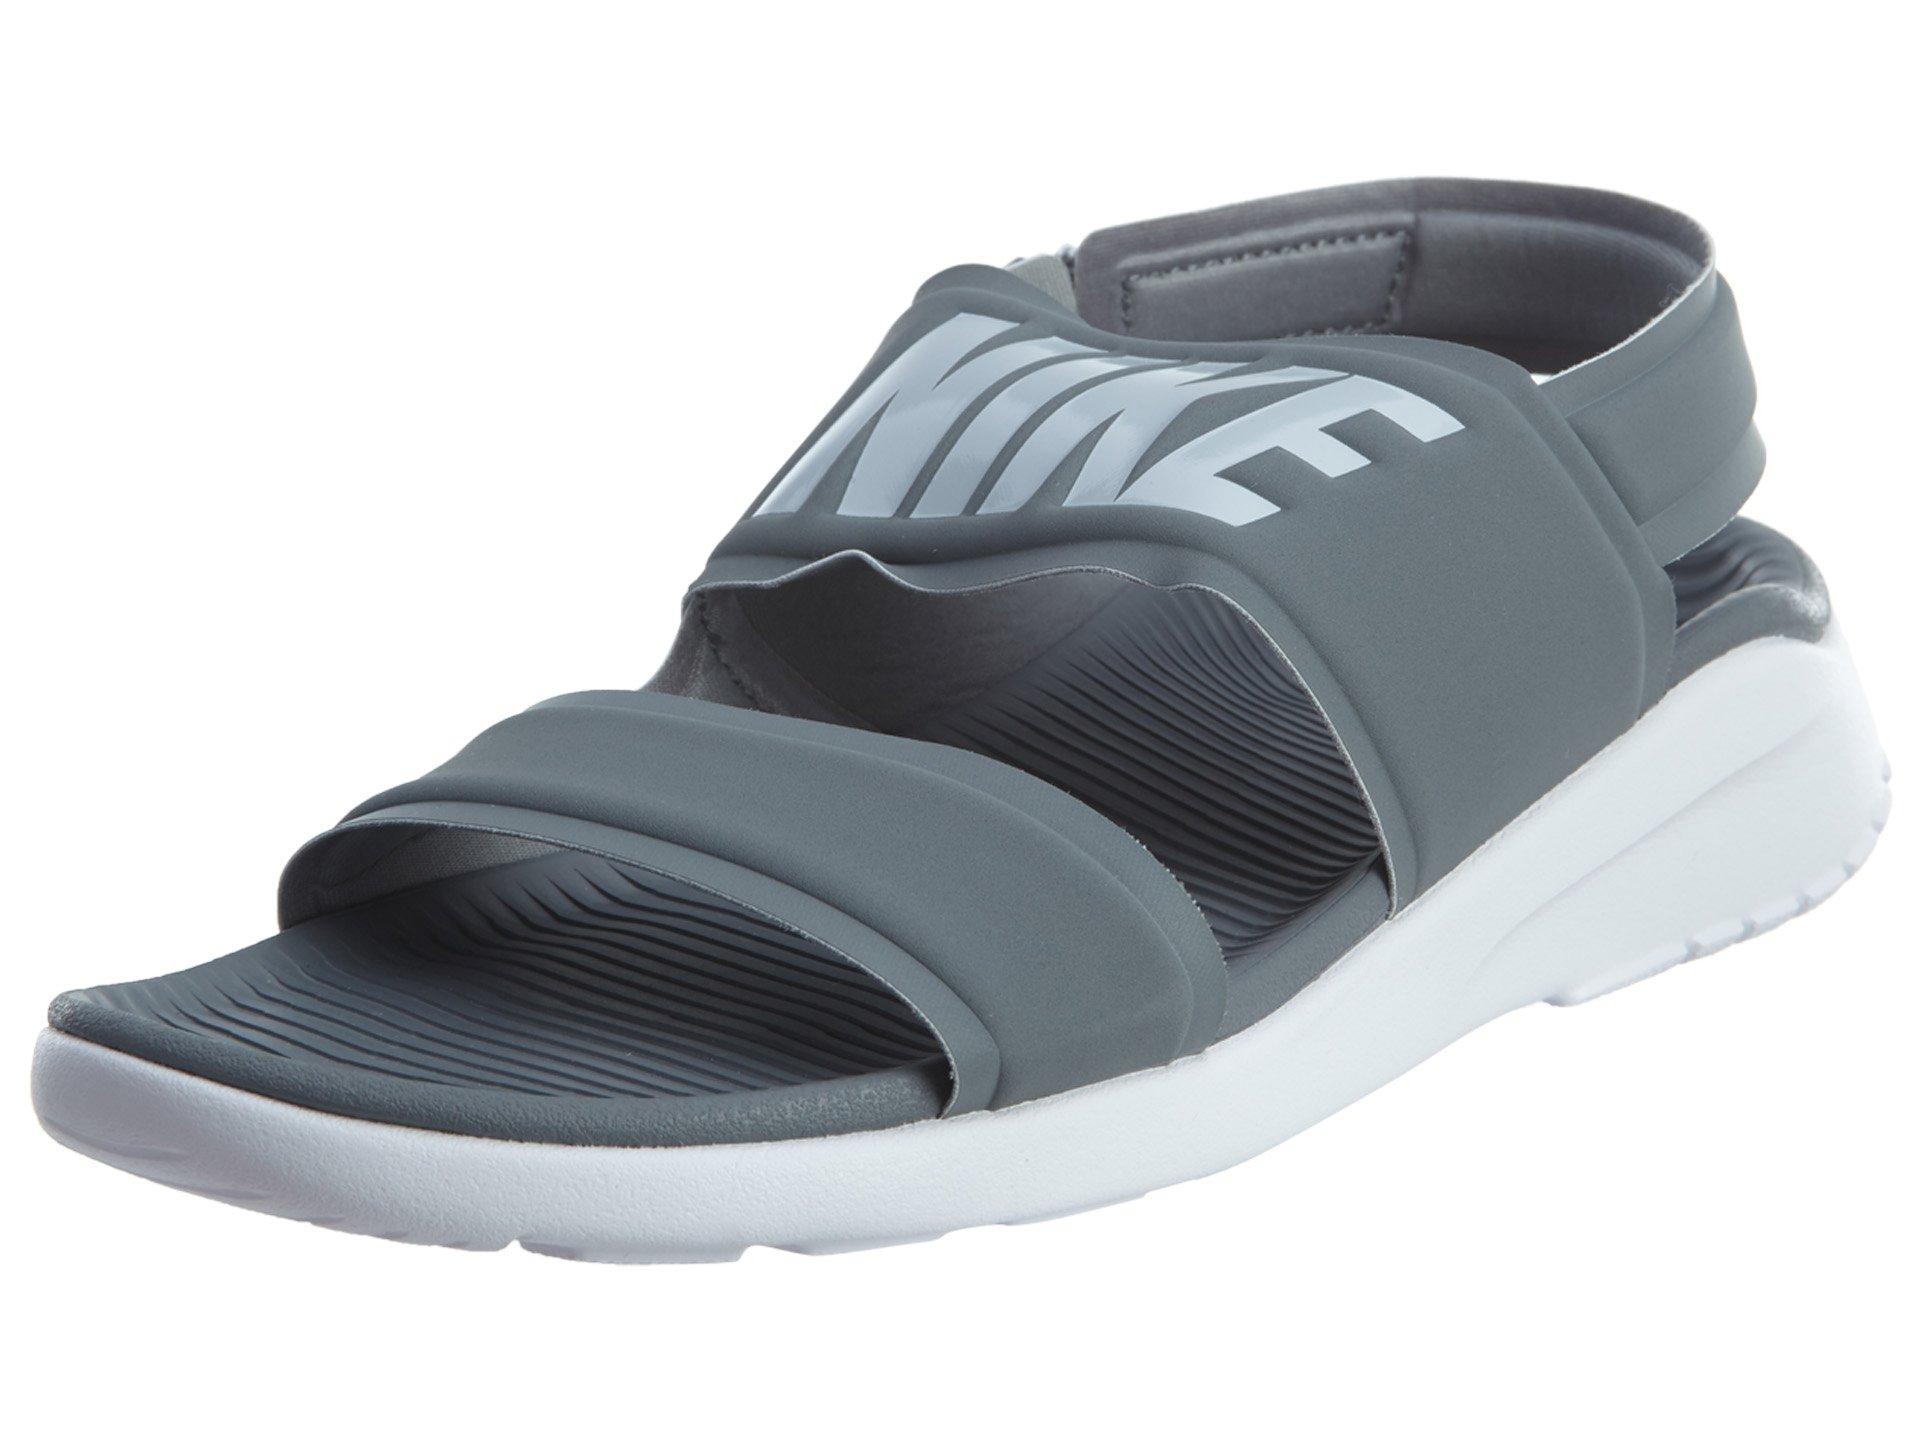 low priced 8aeb9 55e97 Galleon - NIKE Womens Tanjun Sandal Cool Grey Pure Platinum White 882694-002  (10 B(M) US)